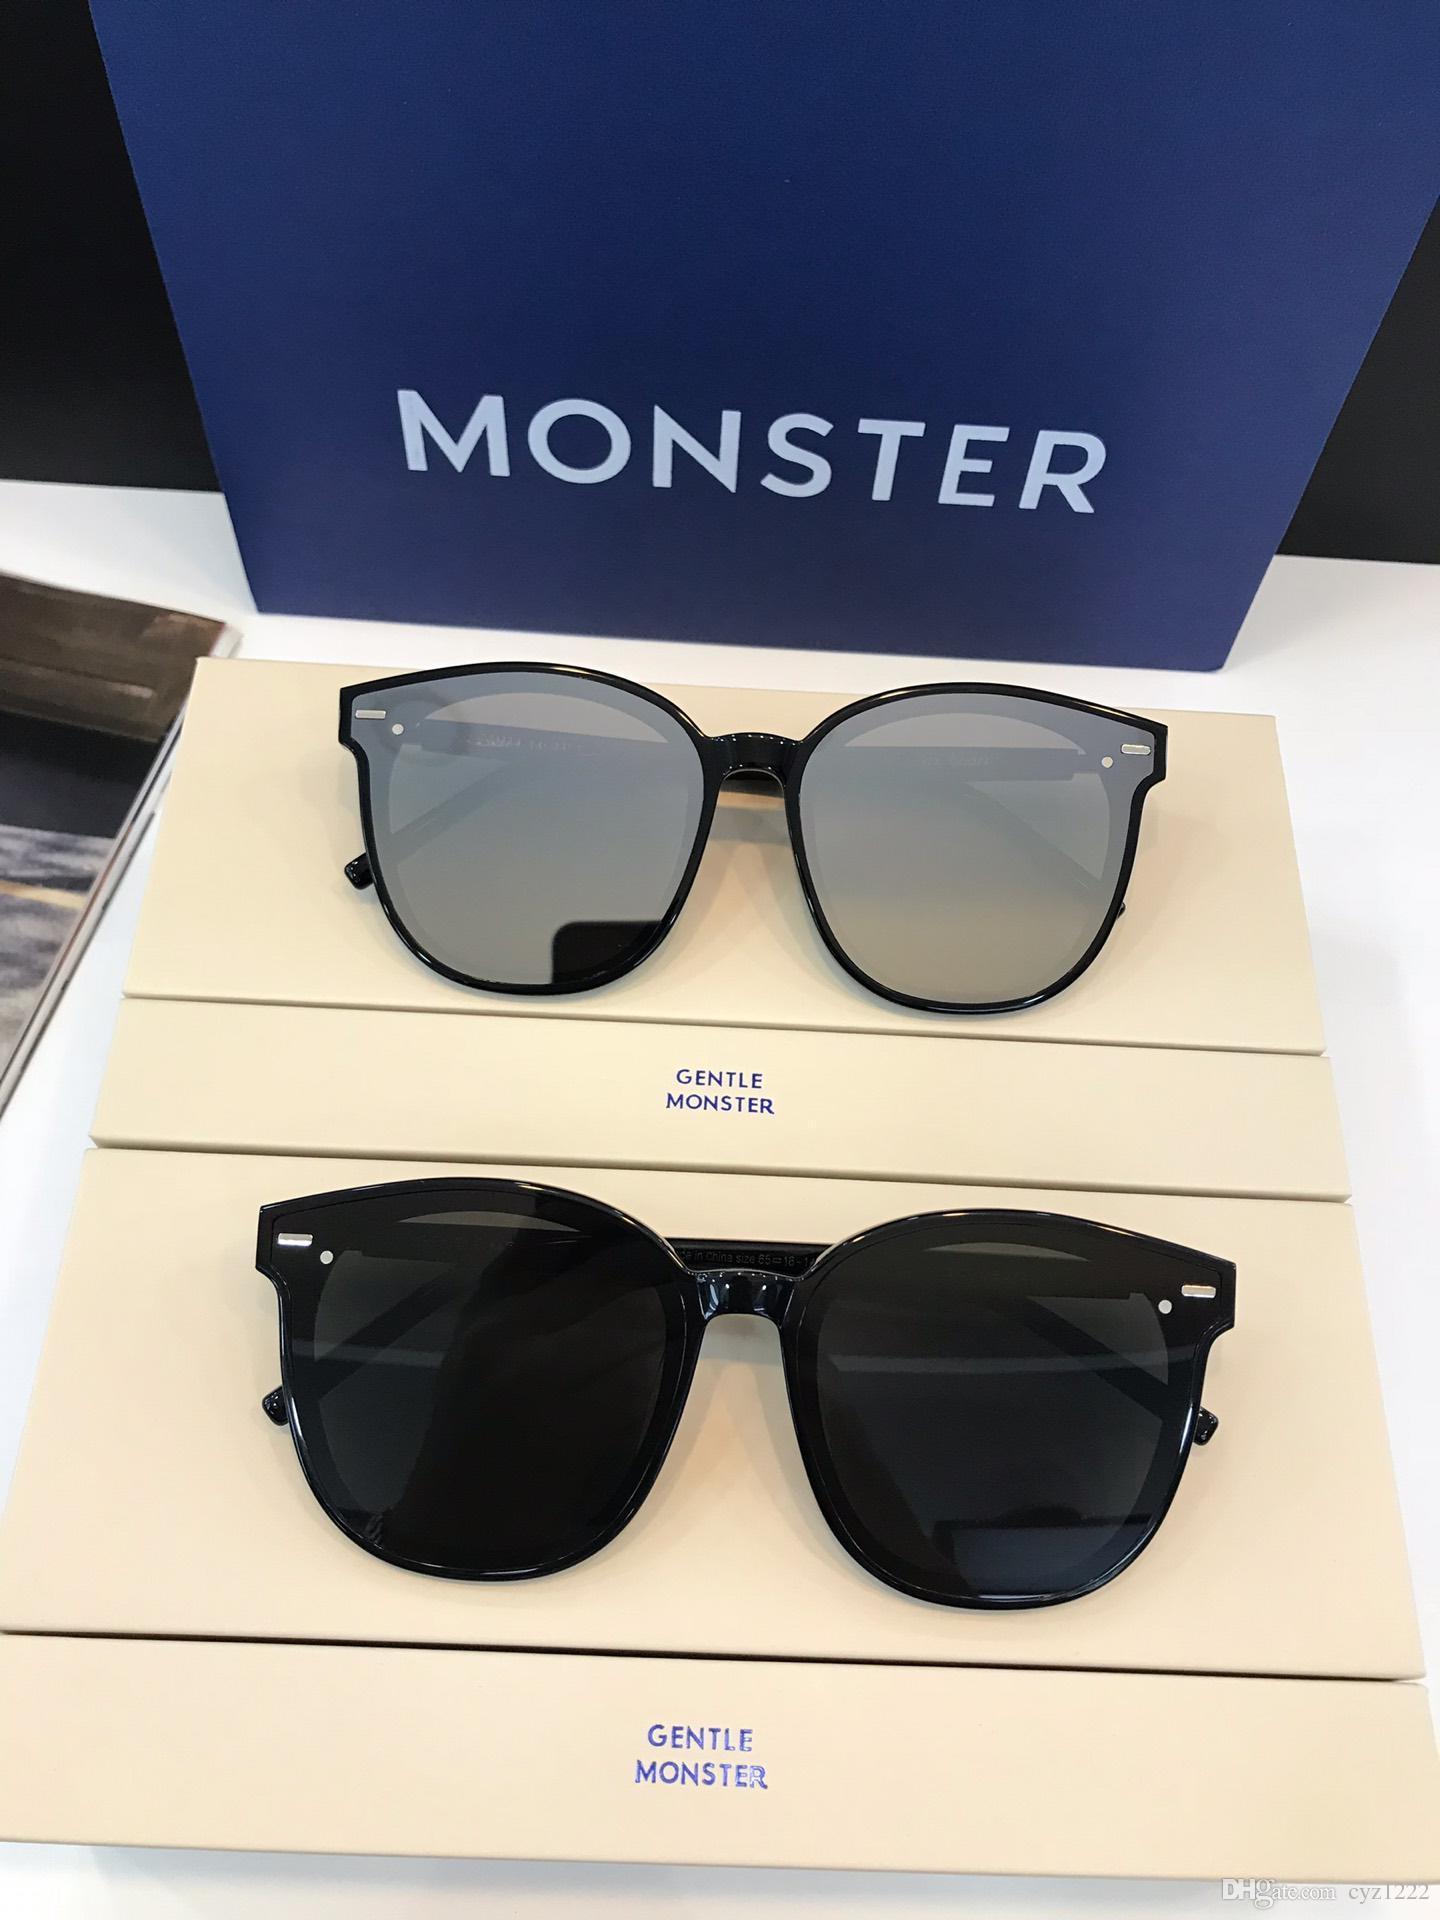 5b9c66e8e0b4 Brand Design 2019 New GM SIX BEARS FLATBA Series Square Plate Frame Stylish  Ladies Thin Face Sunglasses Circle Sunglasses Glass Frames From Cyz1222